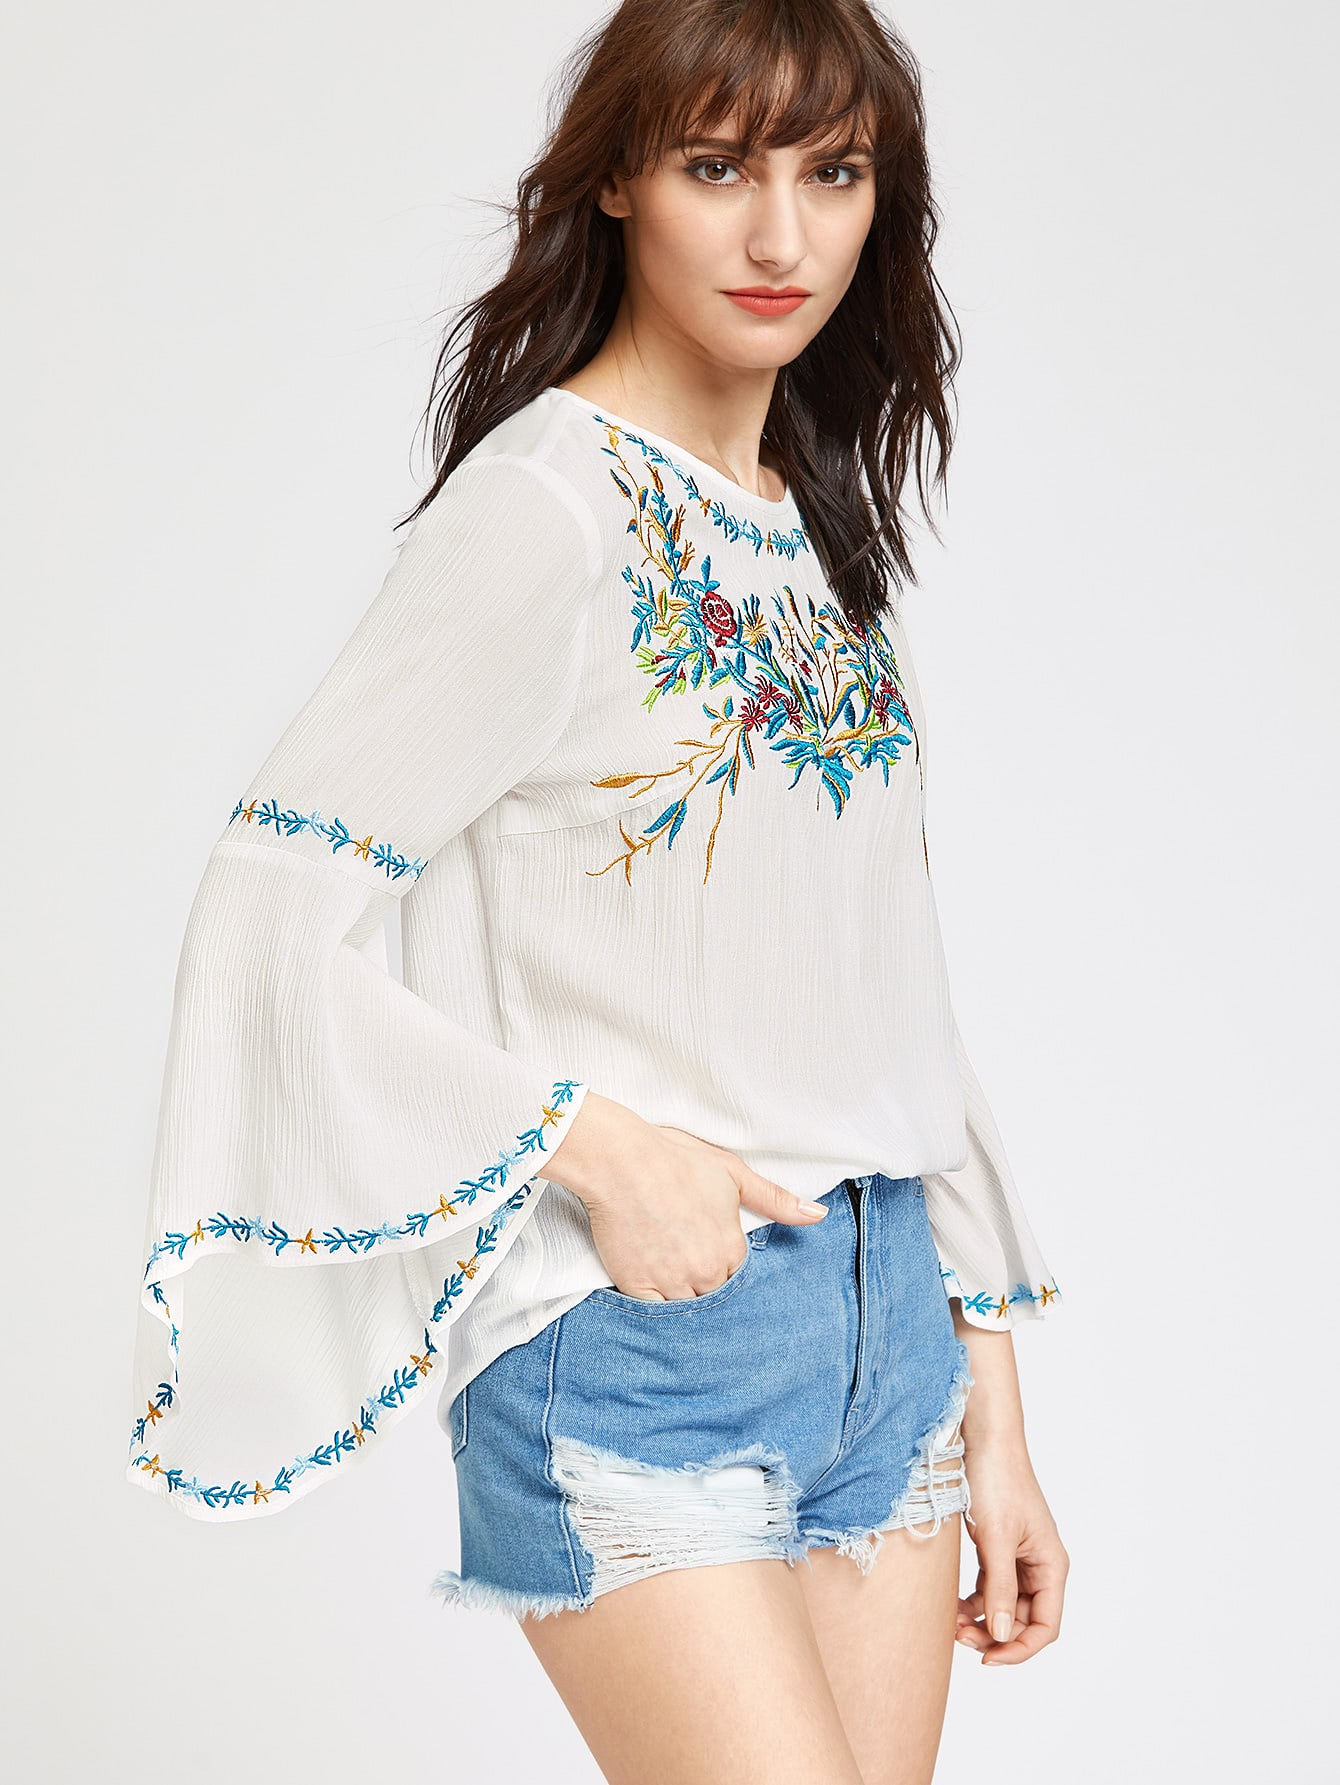 blouse170310704_2